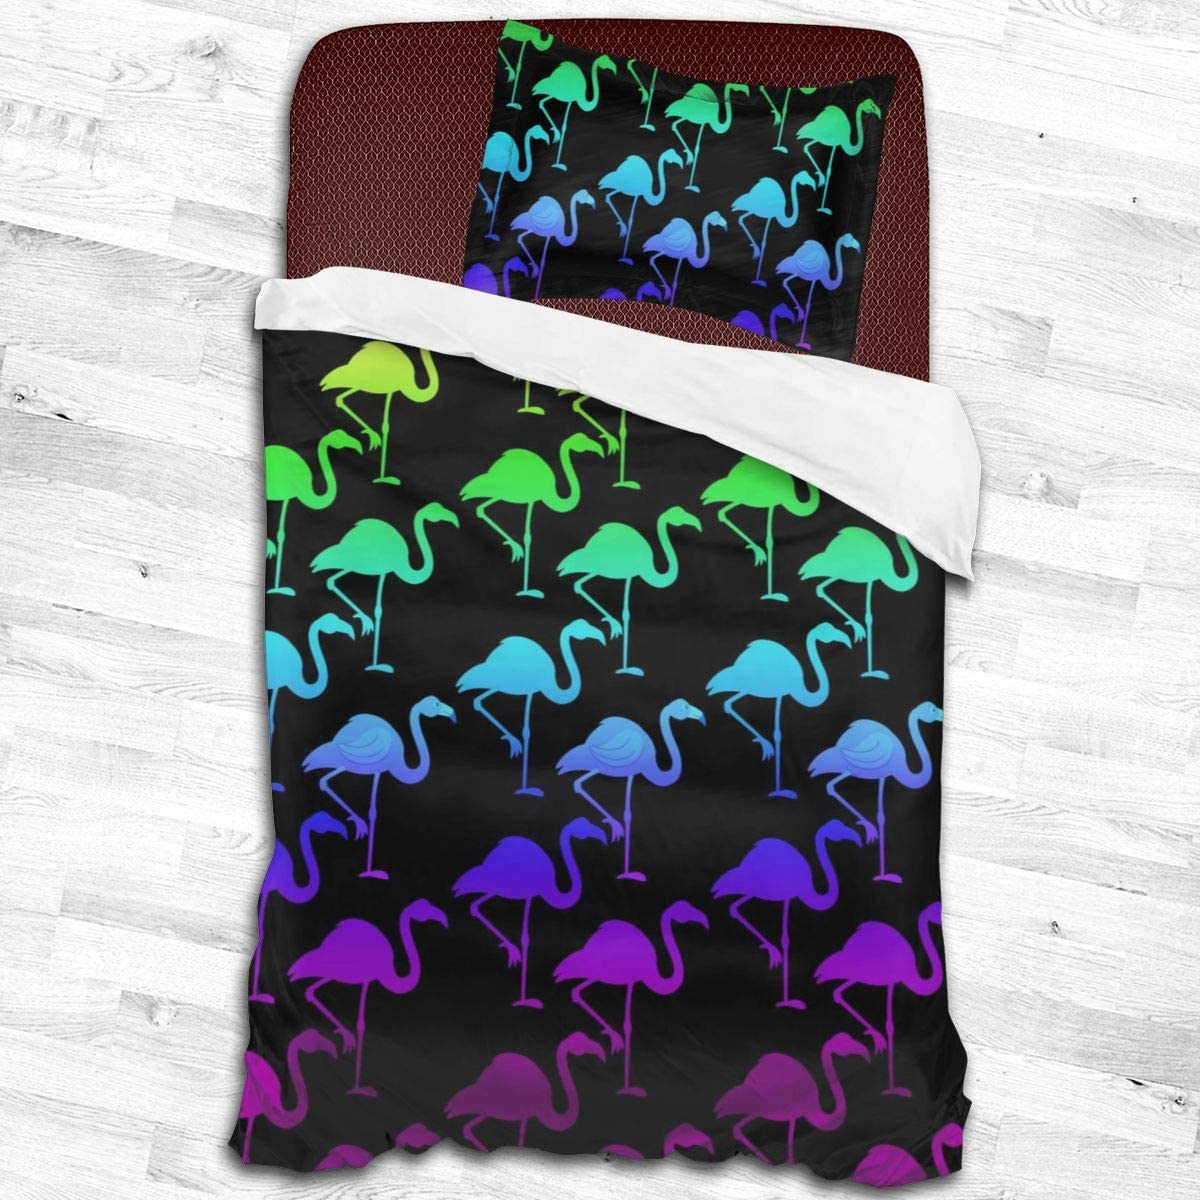 Baliboon Bed Sheet Set Colorful Sheets Discount mail order Bedding Flamingo Alternative dealer in Black